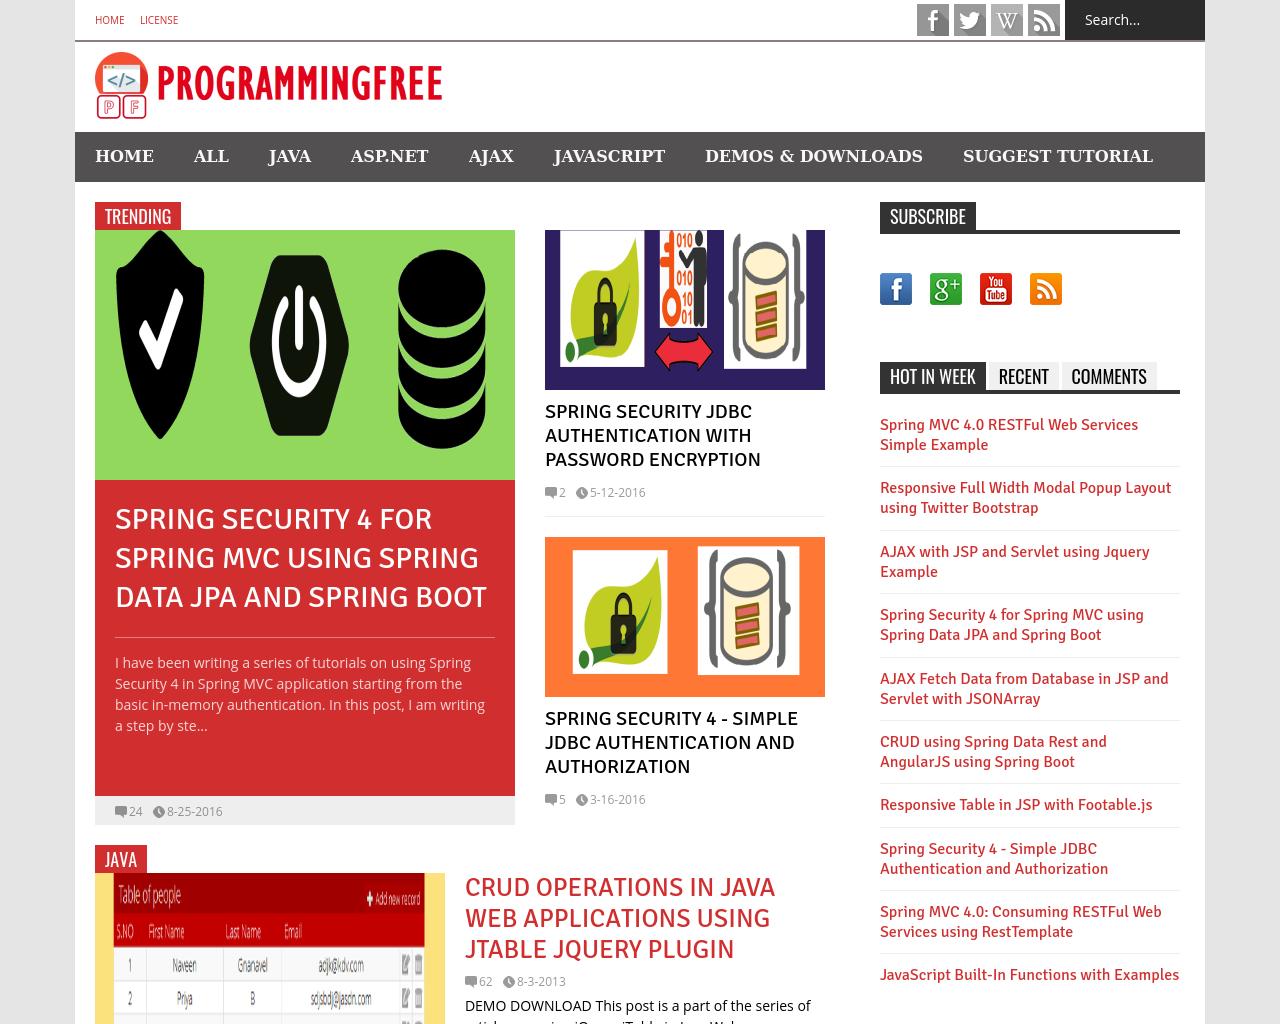 ProgrammingFree-Advertising-Reviews-Pricing